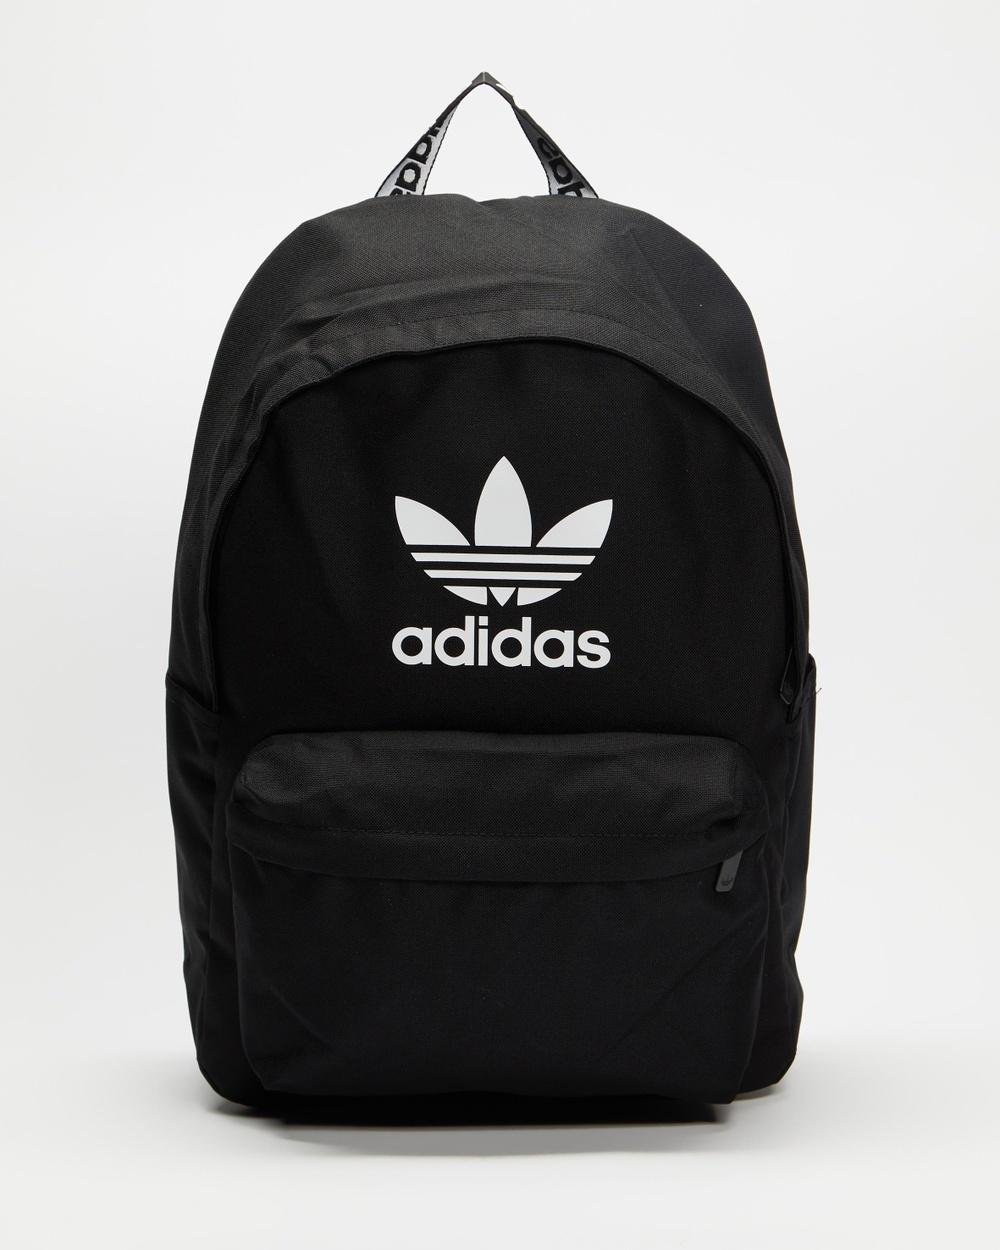 adidas Originals Adicolor Backpack Backpacks Black & White